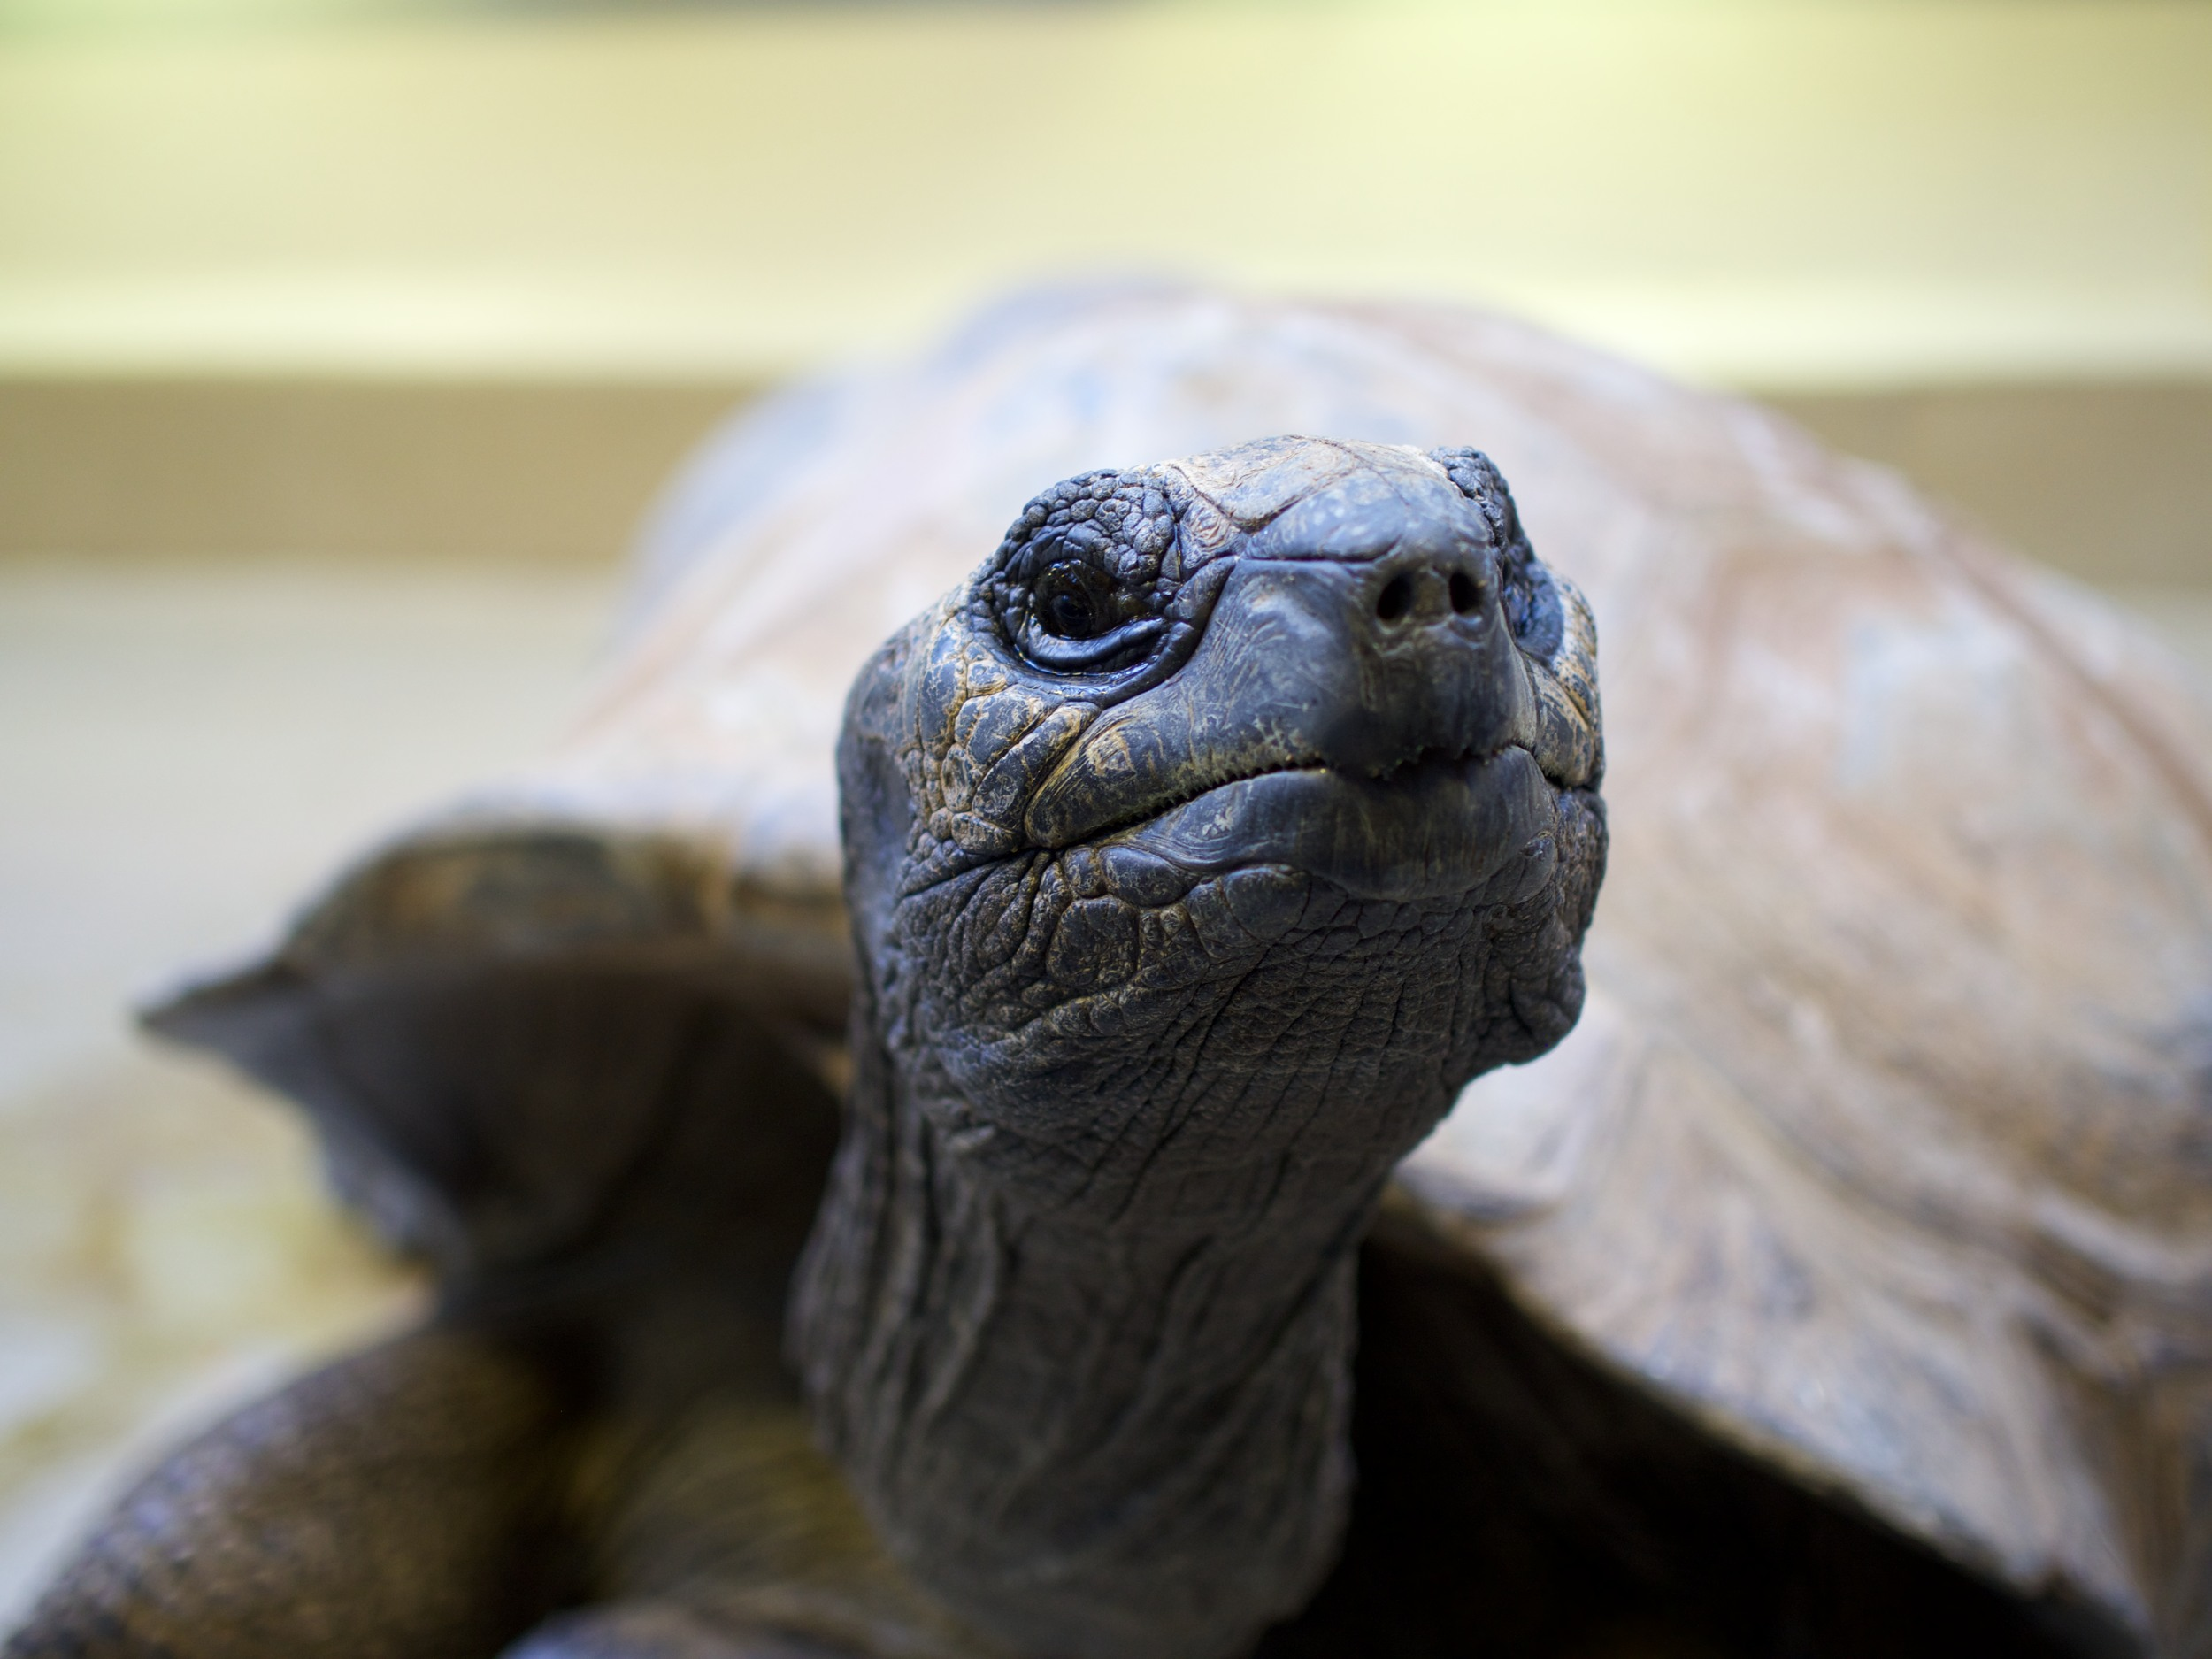 Turtle in D.C. Zoo